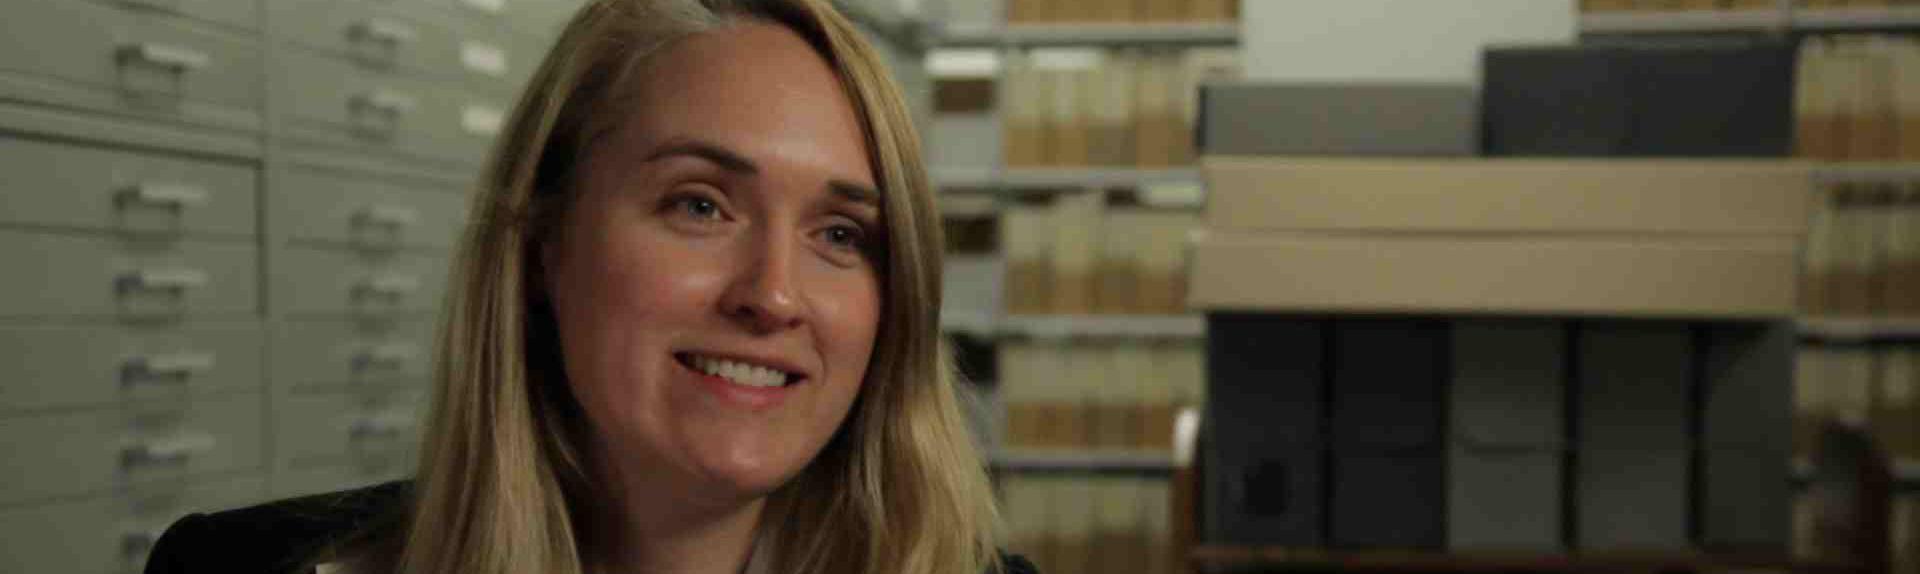 Jenny Robb, Curator at BICLM